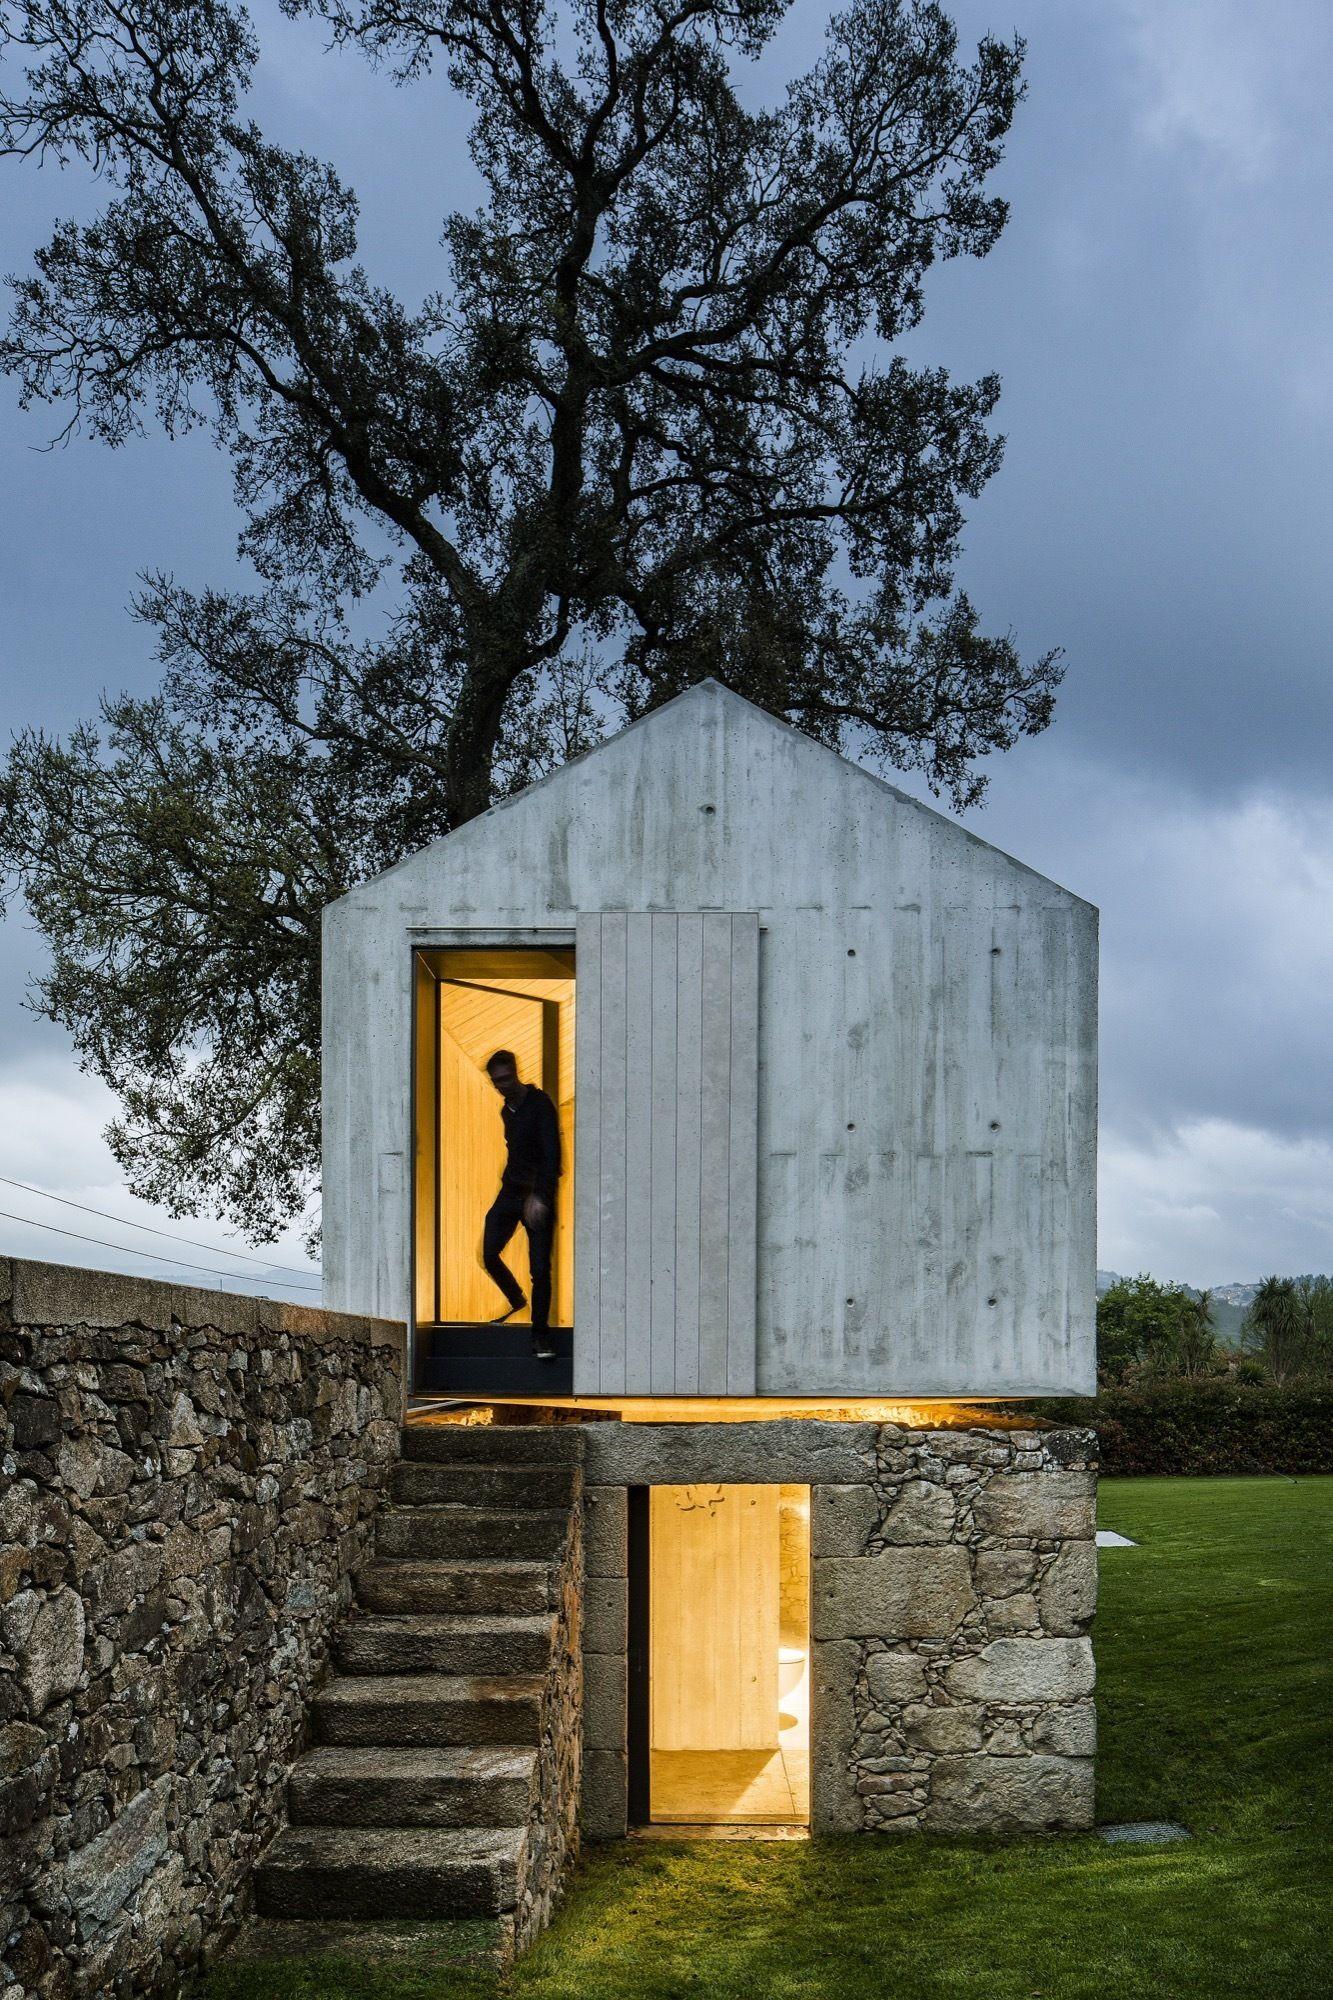 Dez casas portuguesas contemporâneas